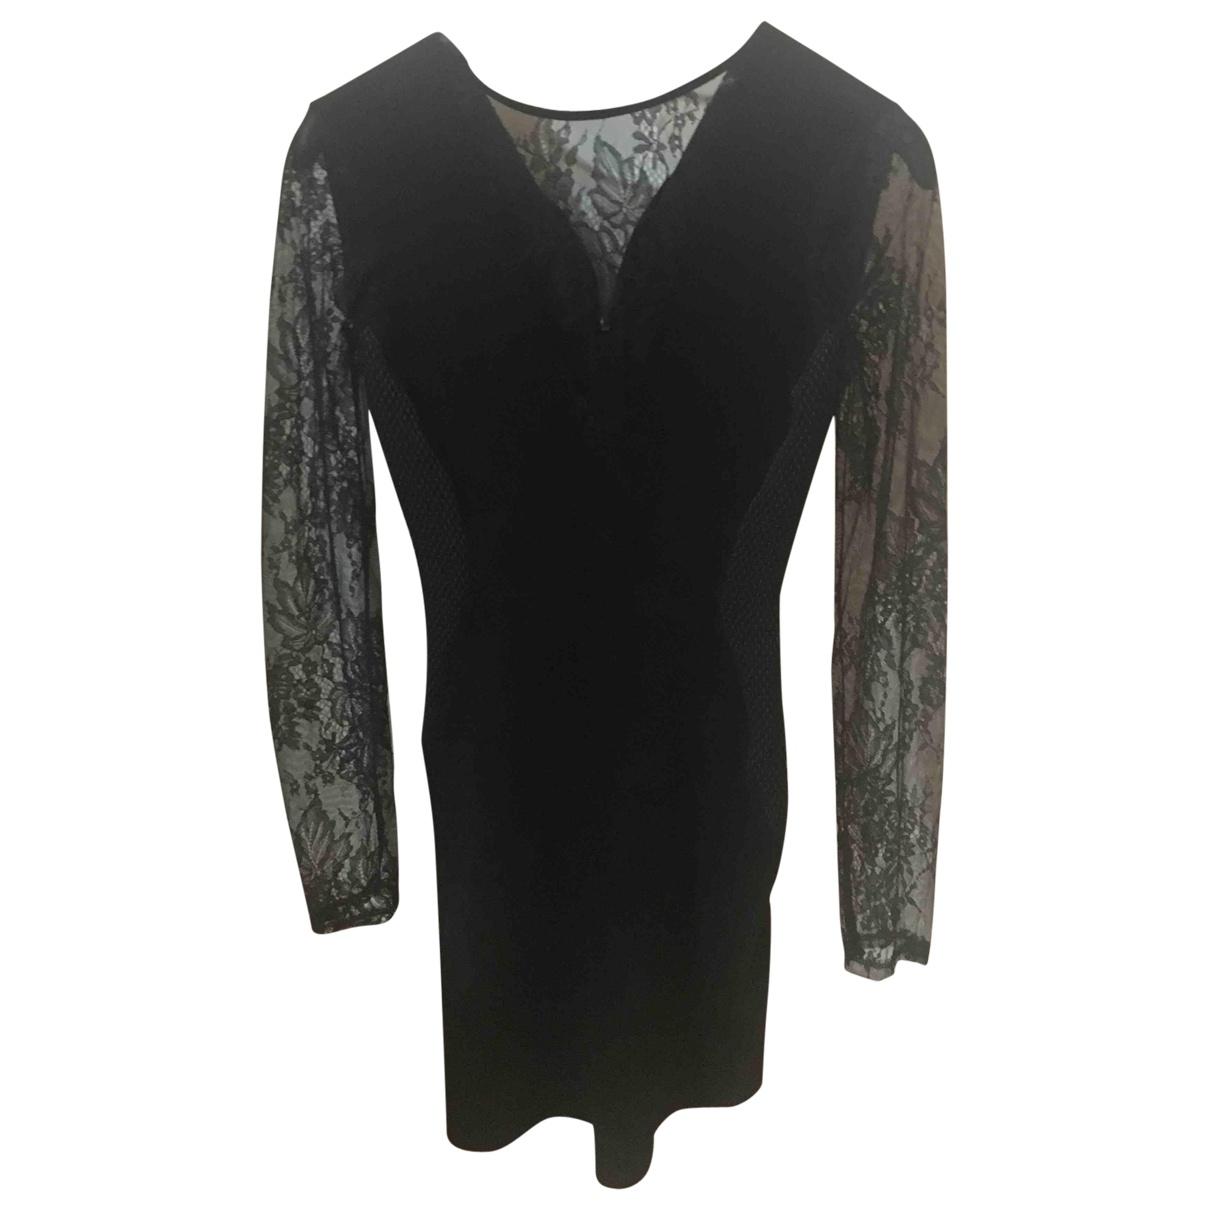 Zara \N Kleid in  Schwarz Veloursleder